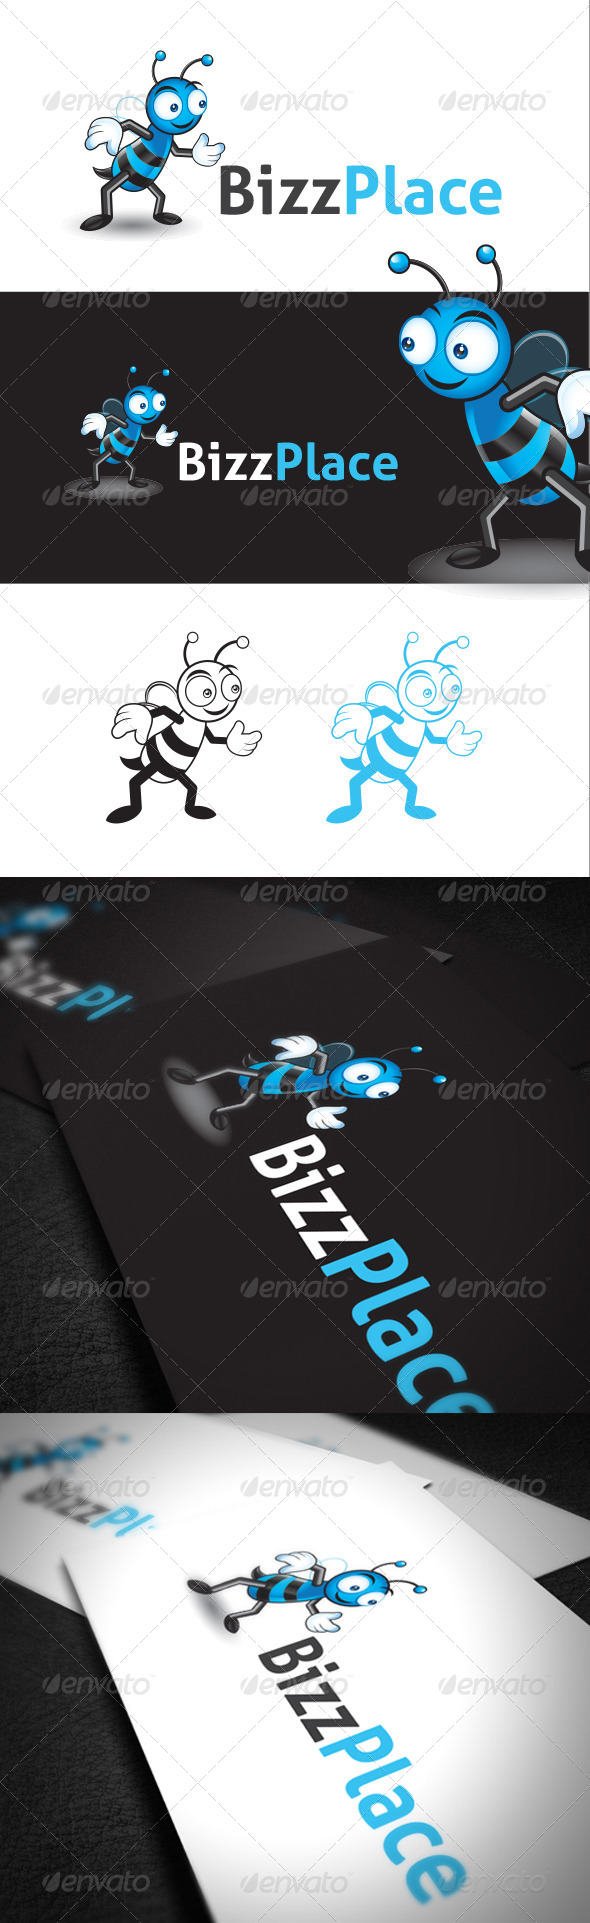 Character Design Bee in Vector Format - Animals Logo Templates